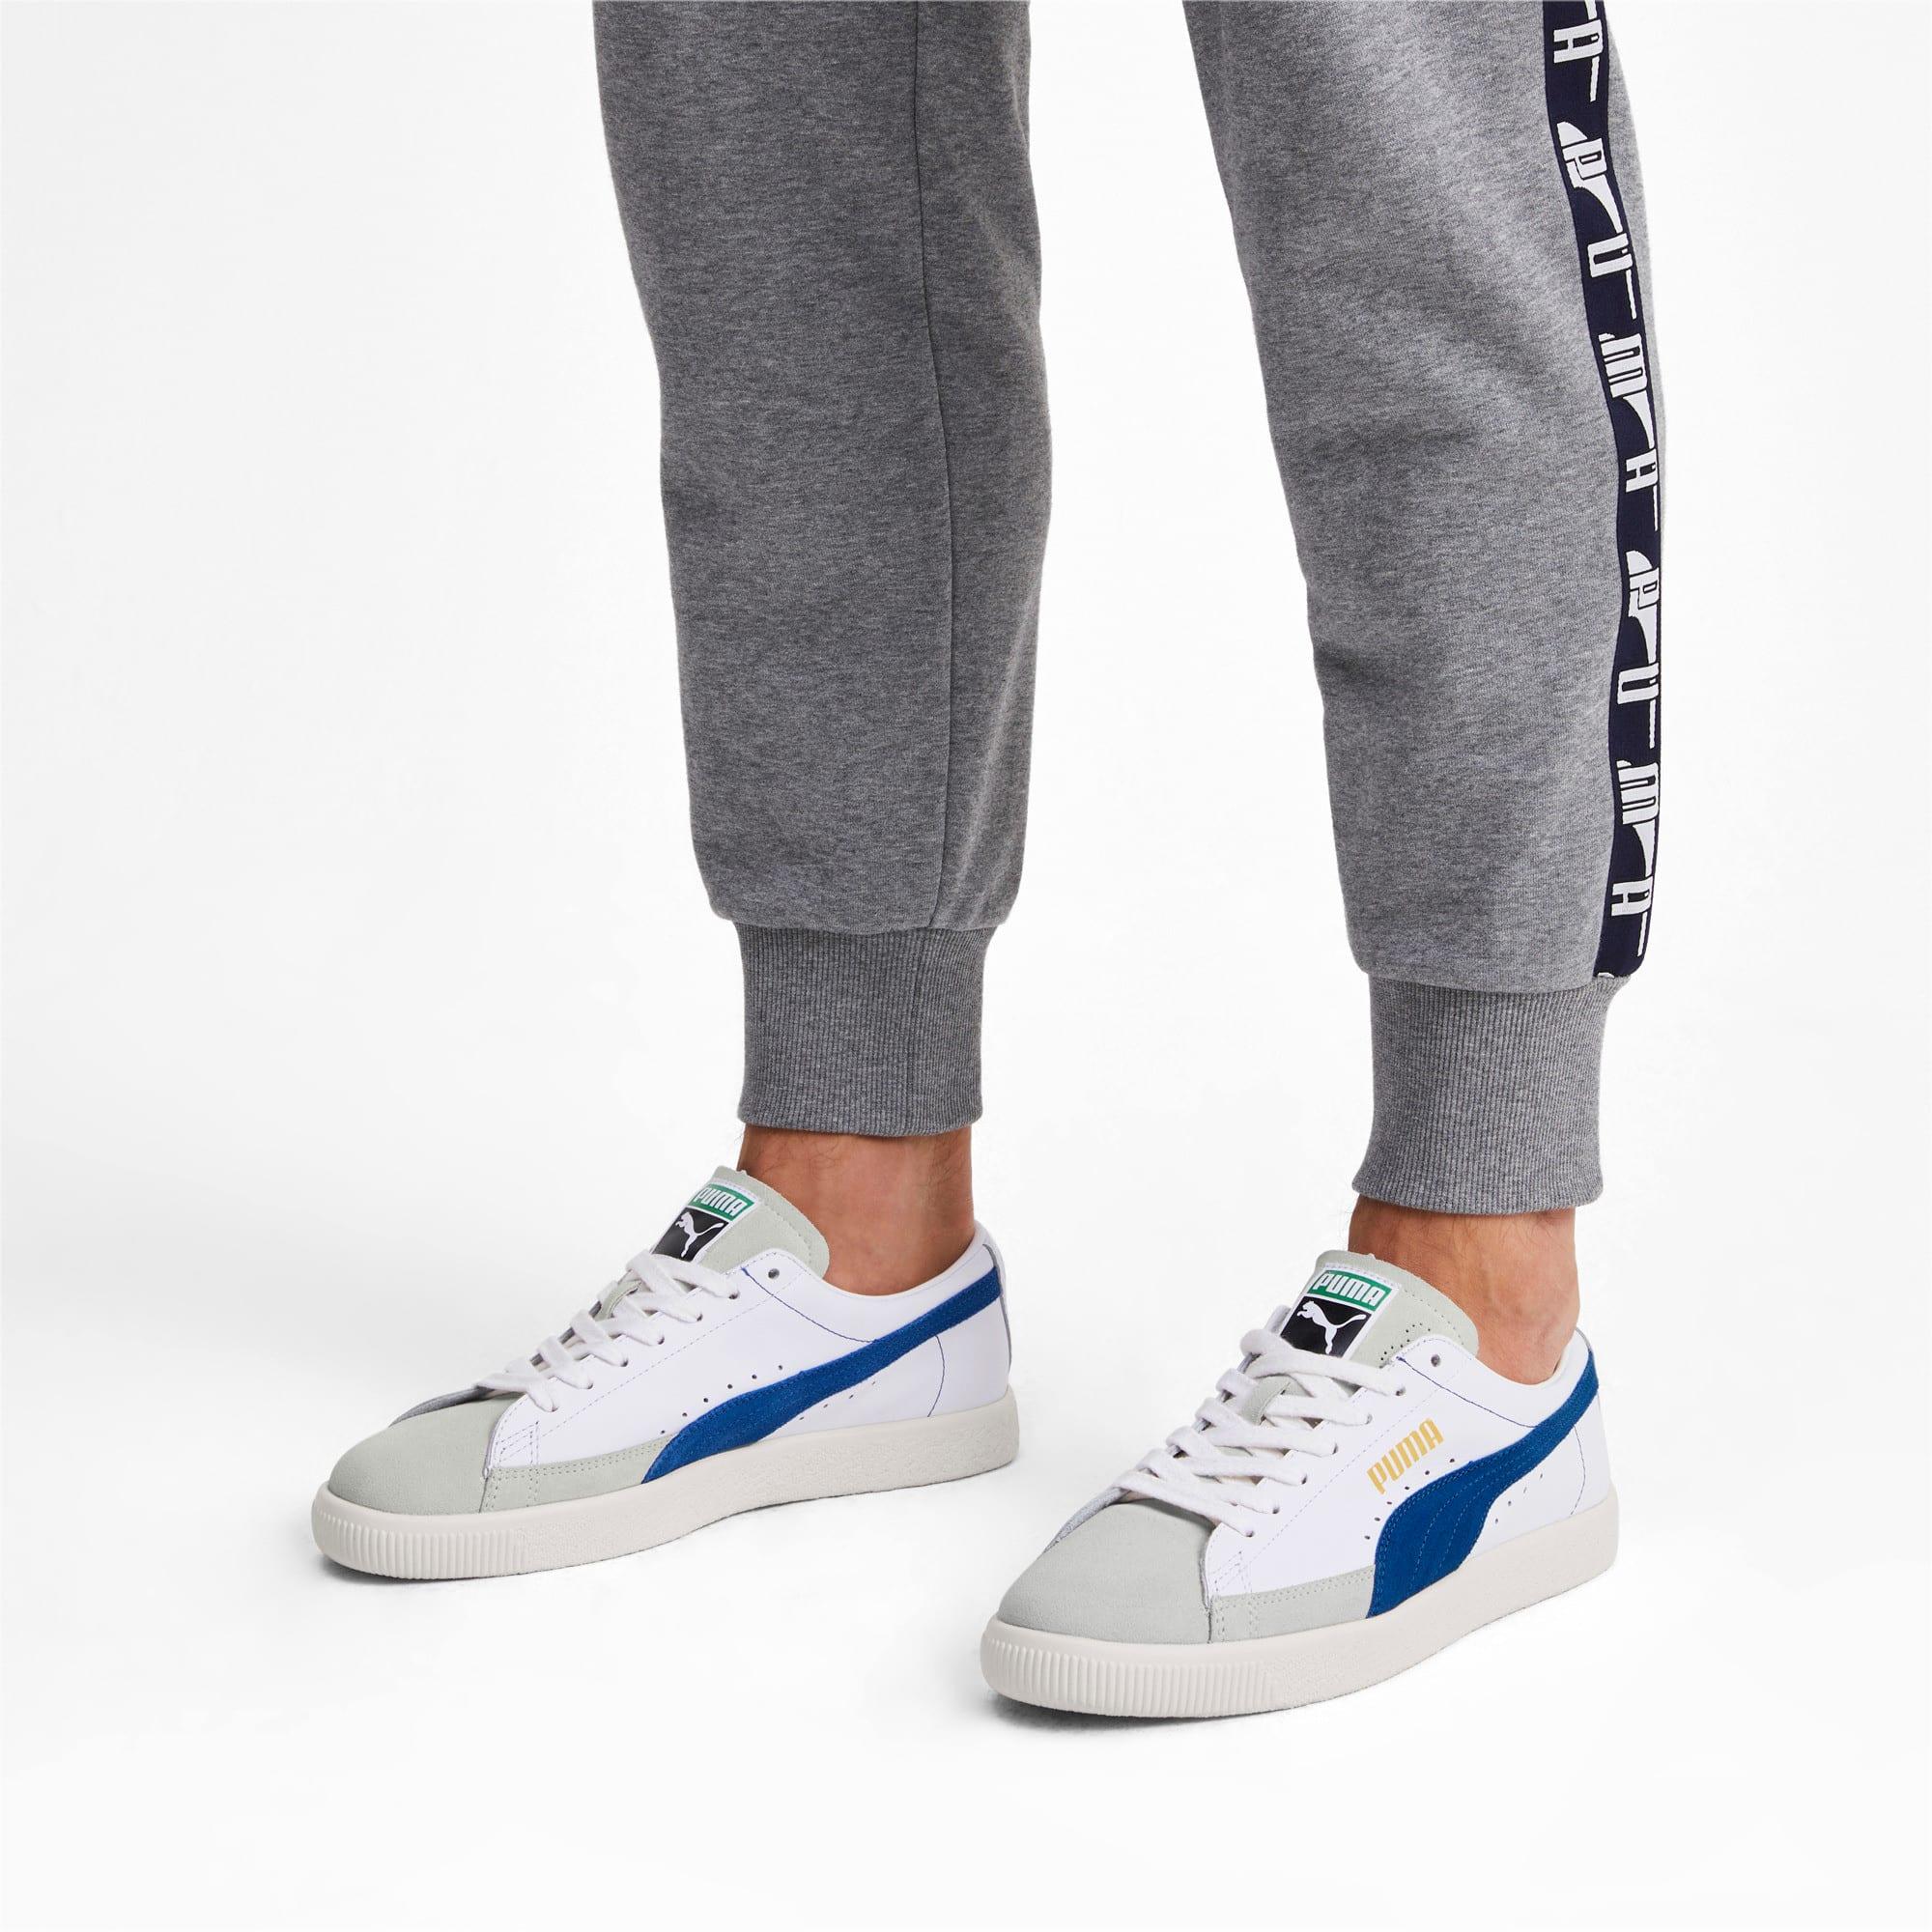 Thumbnail 3 of Basket 90680 Sneakers, Puma White-Galaxy Blue-Whisp, medium